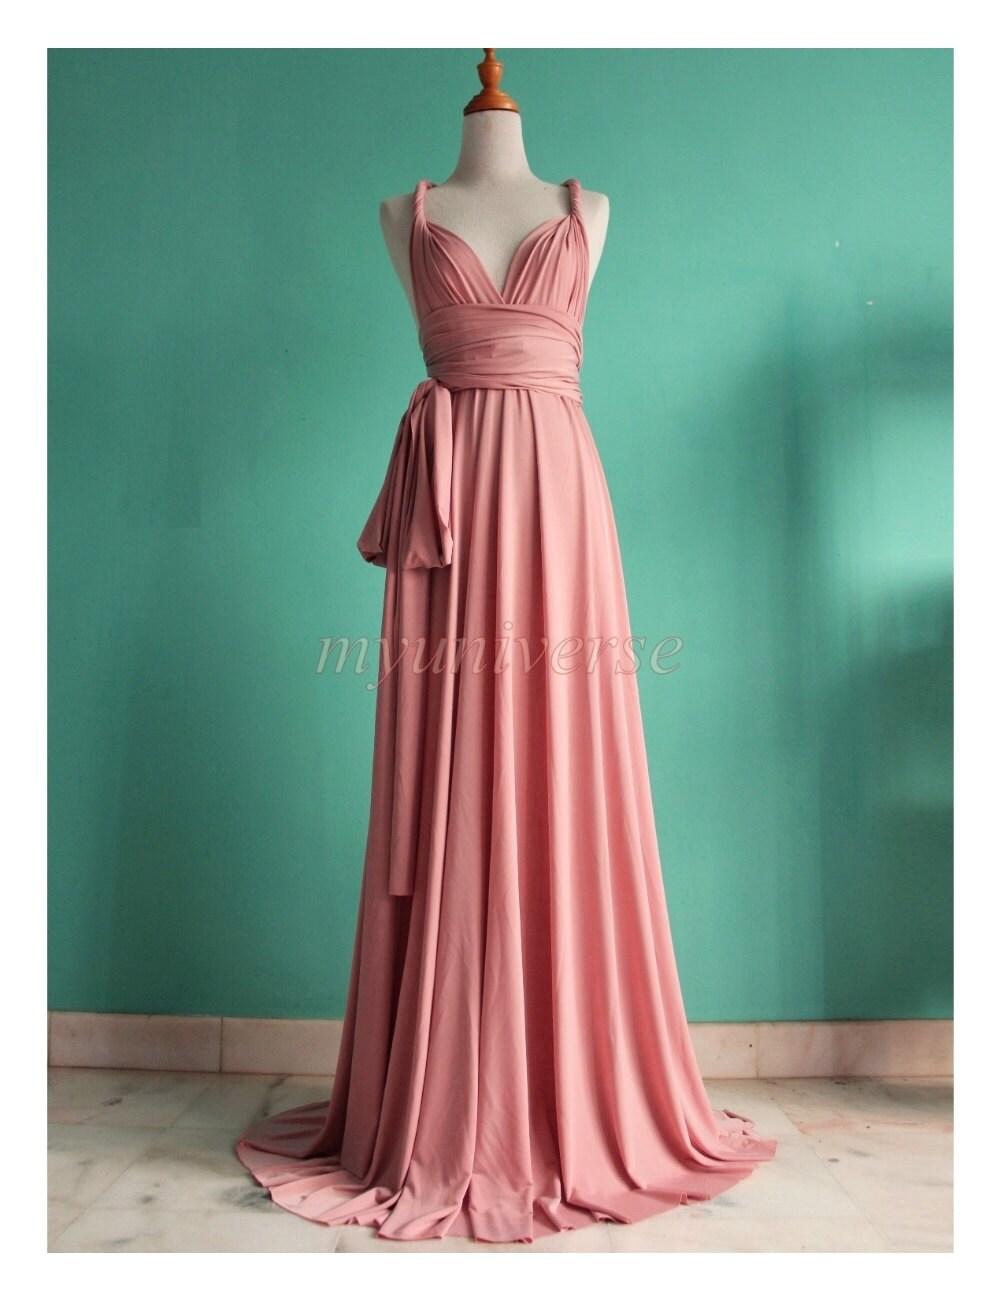 Pink Bridesmaid Dress Wrap Convertible Dress Pastel Peach